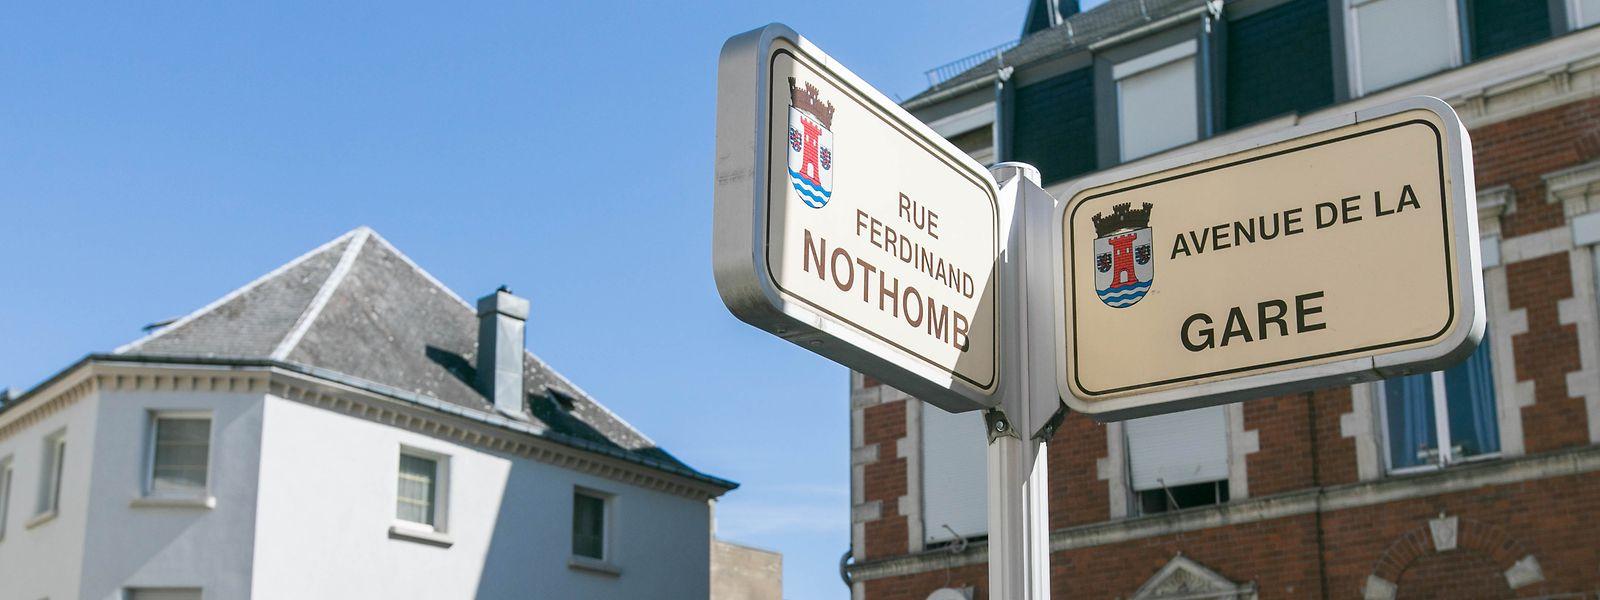 Das Ende der Avenue de la Gare in Esch/Alzette gilt als sozialer Brennpunkt.